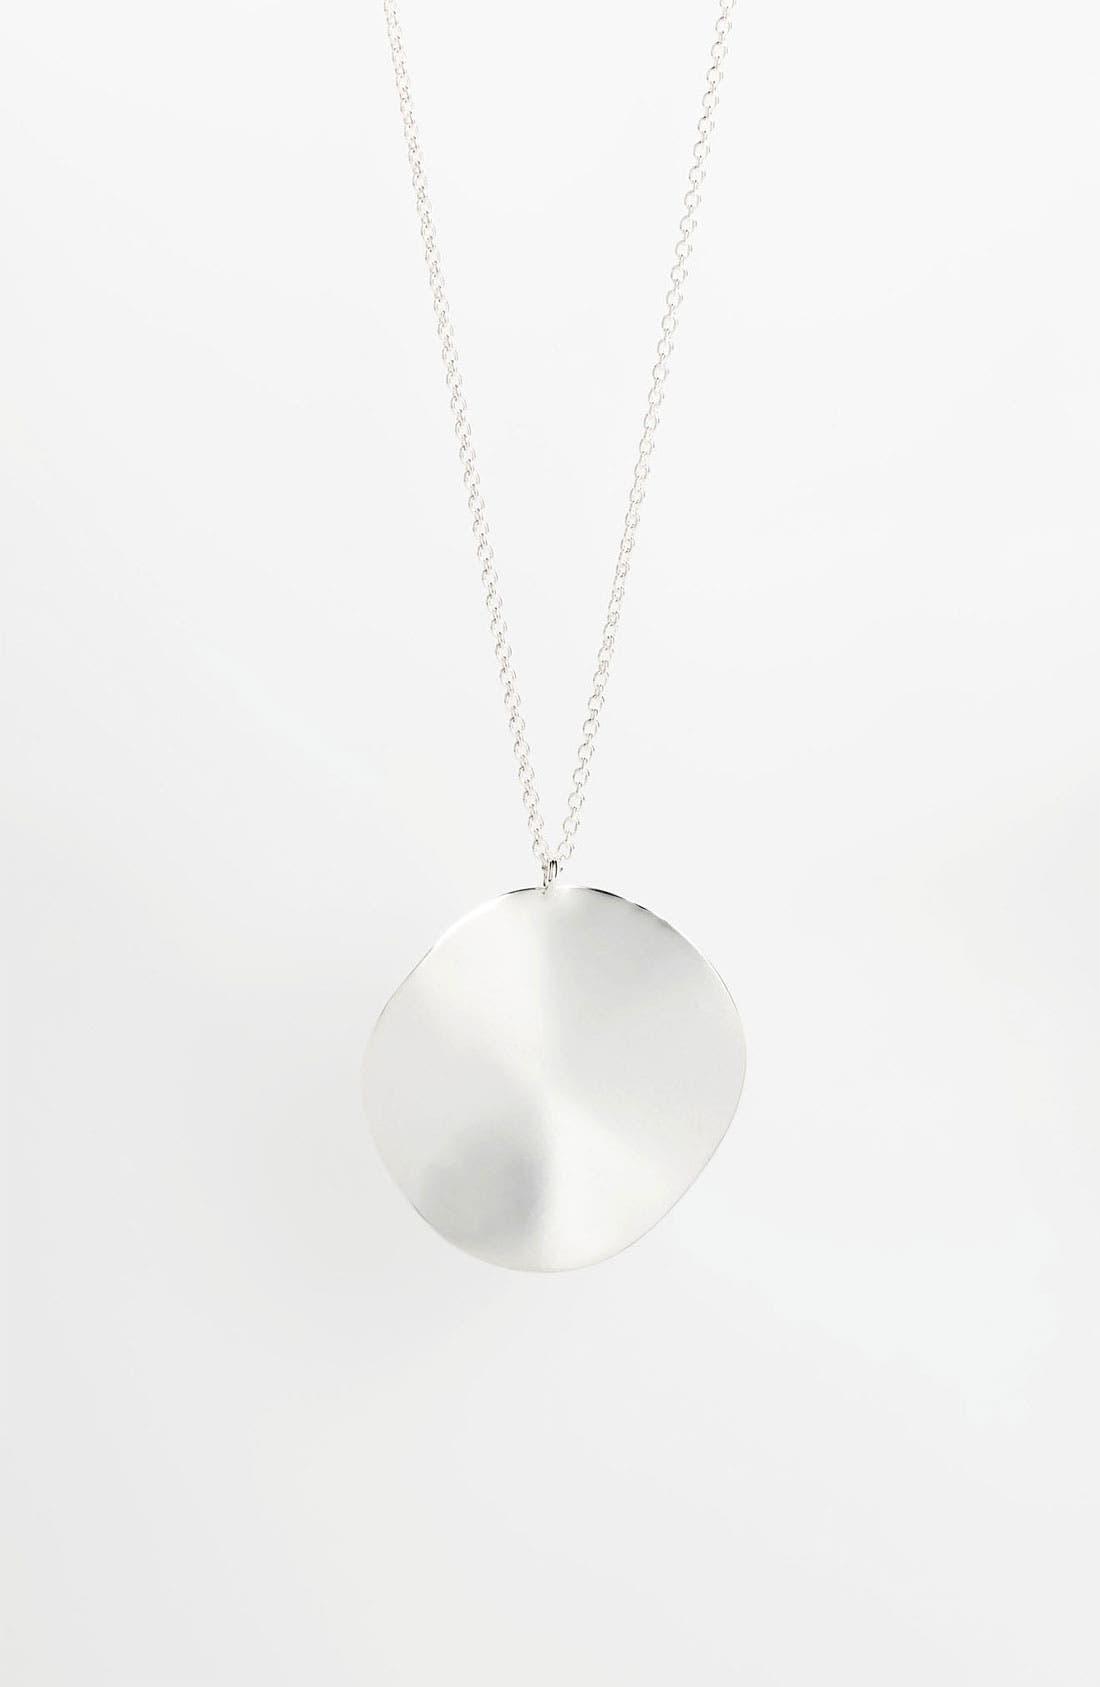 Alternate Image 1 Selected - Ippolita 'Scultura' Long Wavy Circle Pendant Necklace